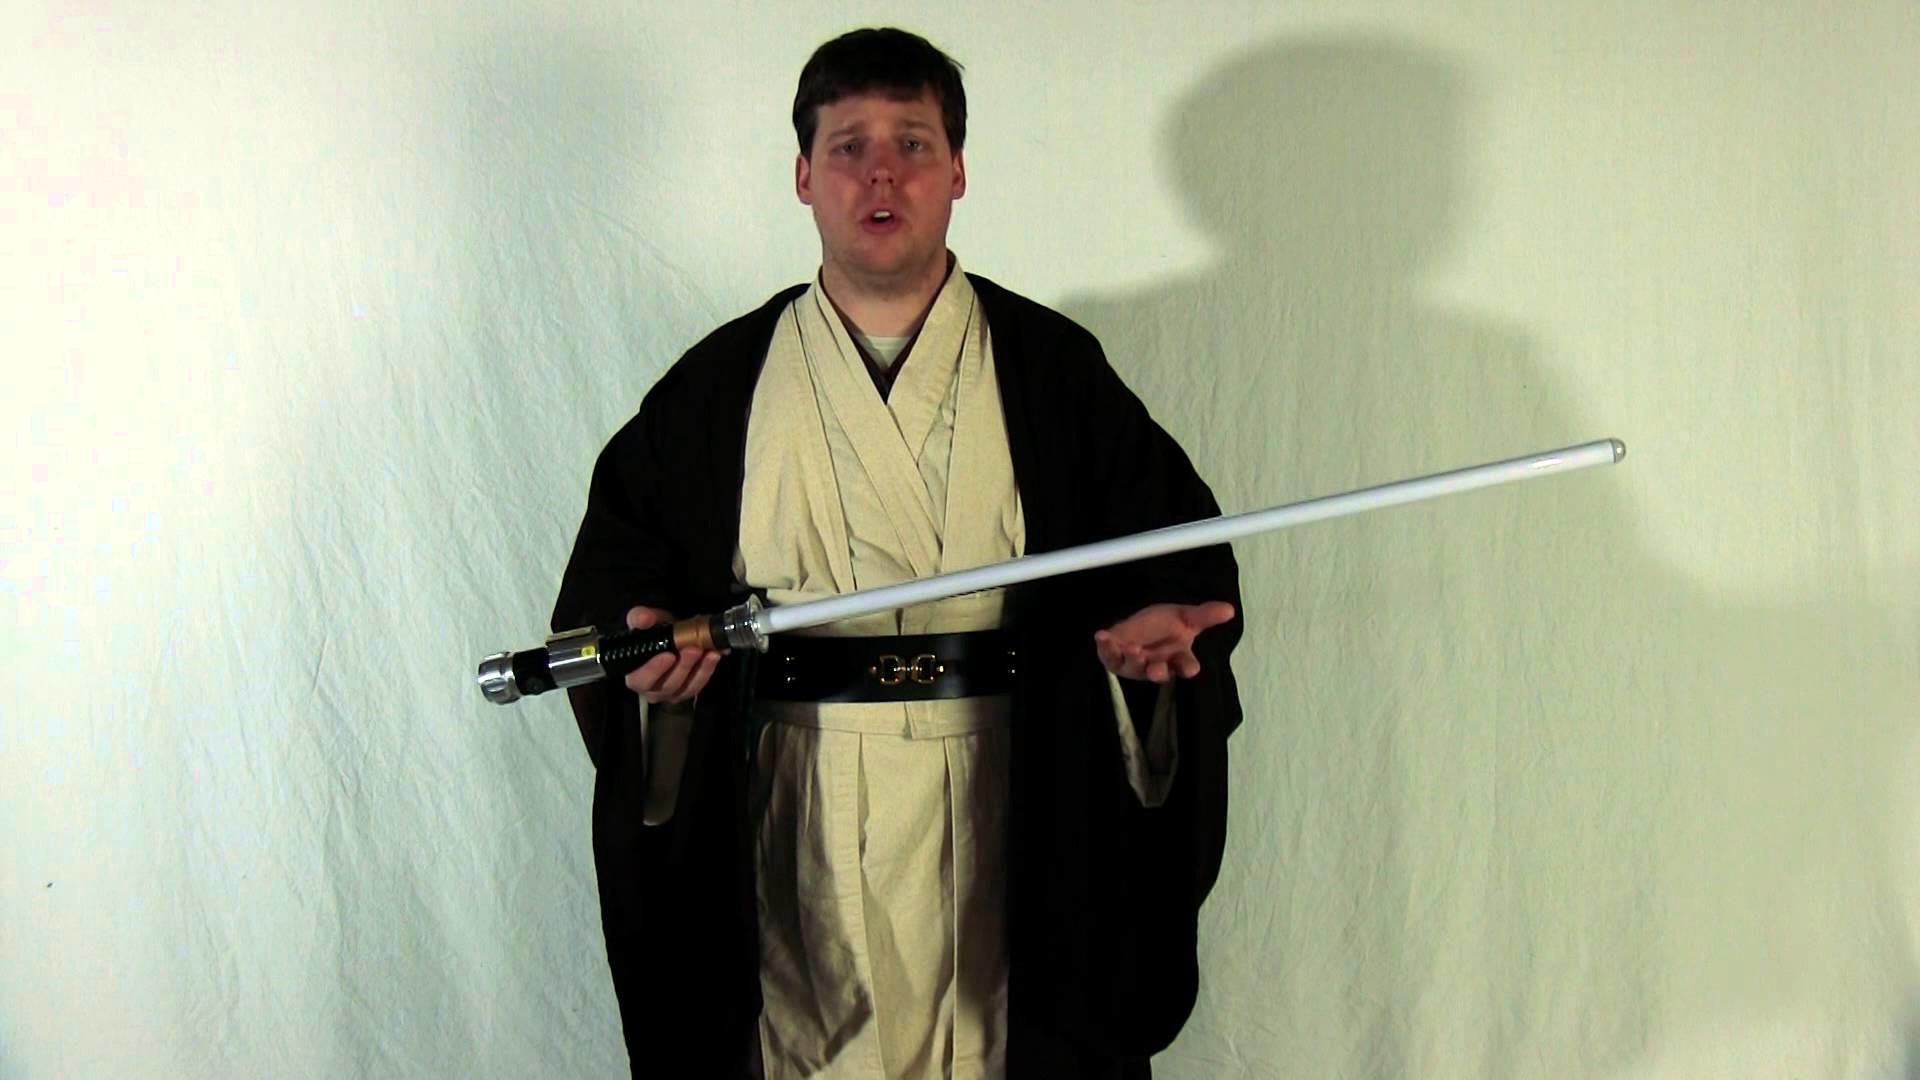 Hasbro Star Wars Obi-Wan Kenobi Lightsaber Review (2010 Version) – The  Force Collector: EP1 – YouTube